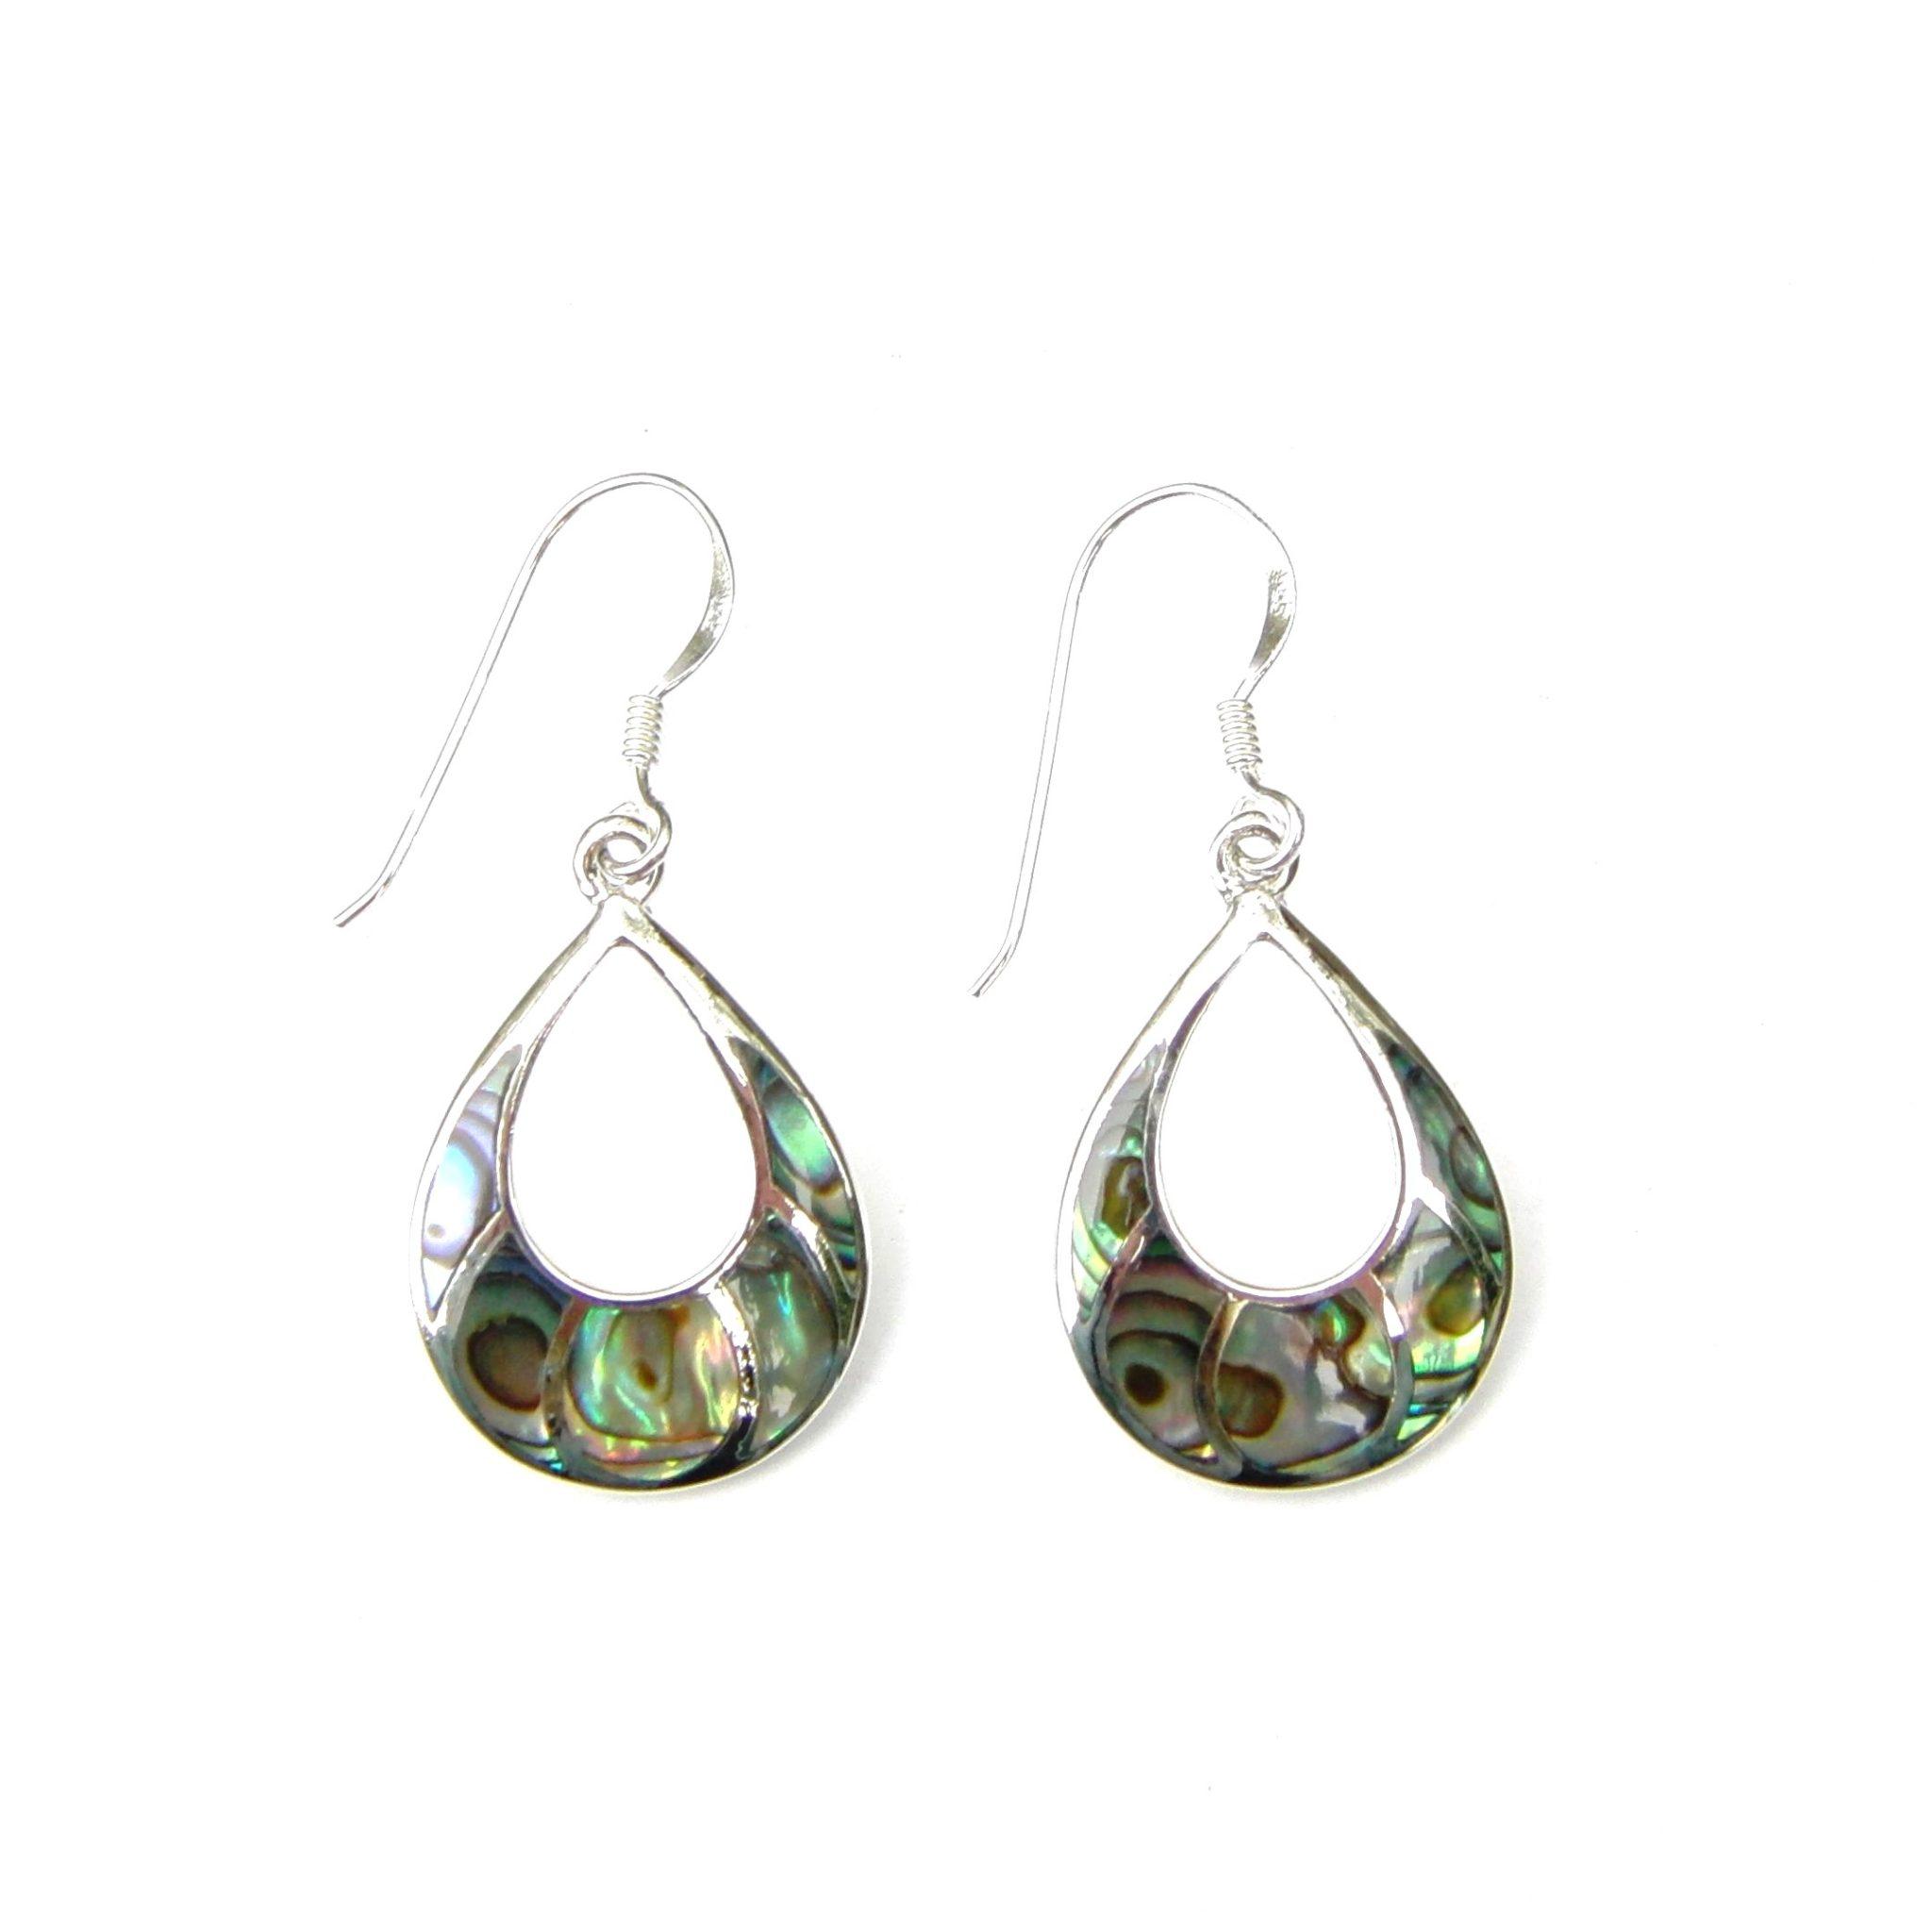 Beautiful Abalone Shell Silver Earrings